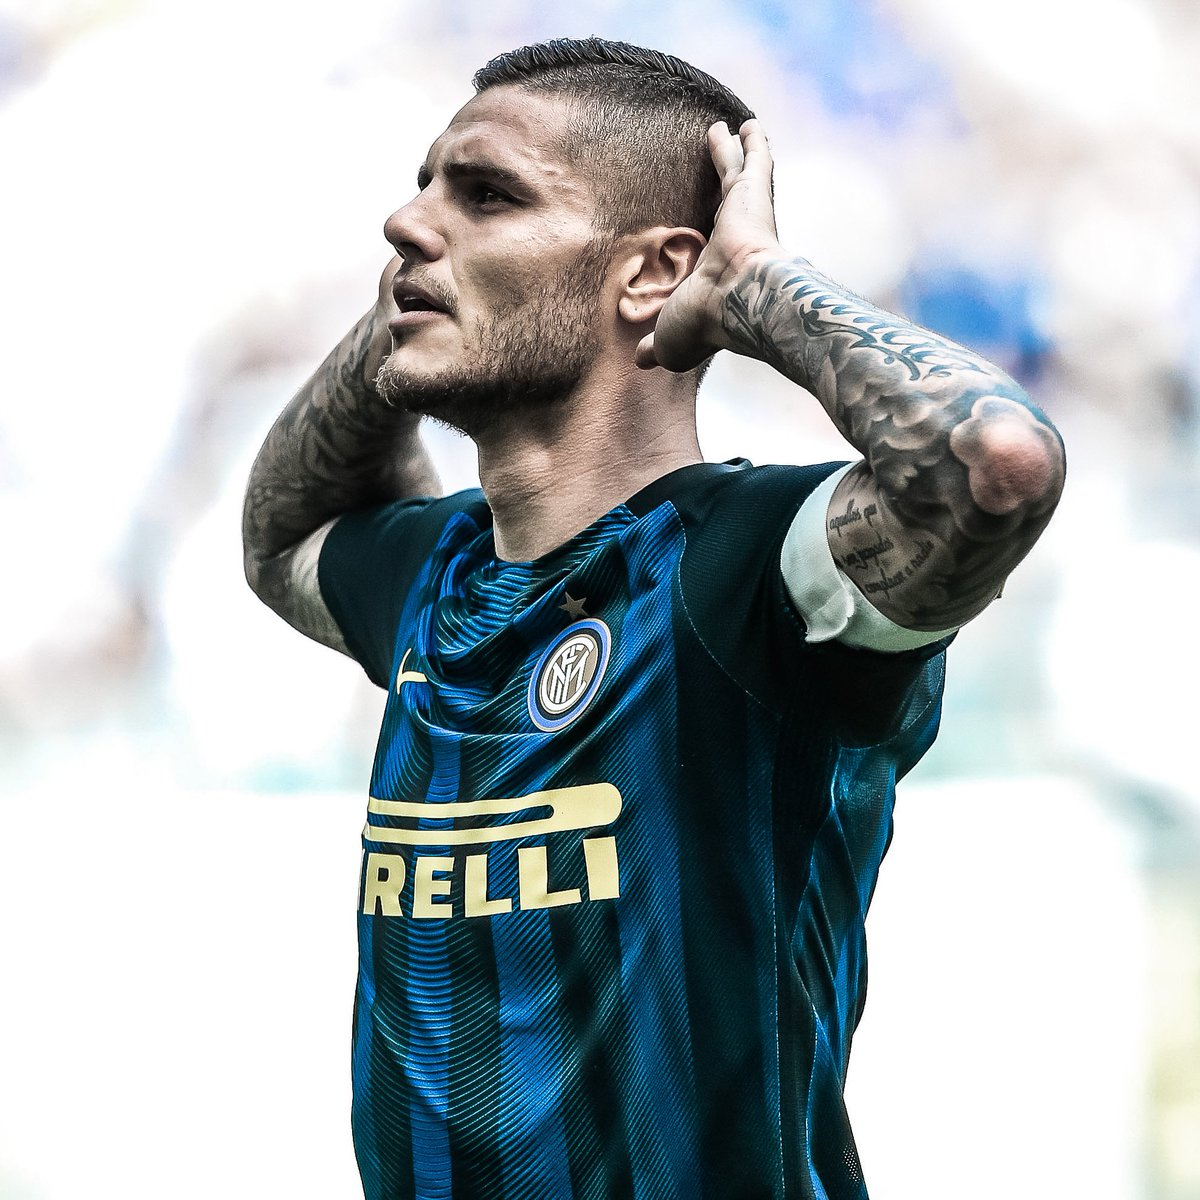 ⚫️🔵 Mauro Icardi at Inter:   👕1⃣9⃣8⃣ ⚽️1⃣1⃣8⃣  #UCL